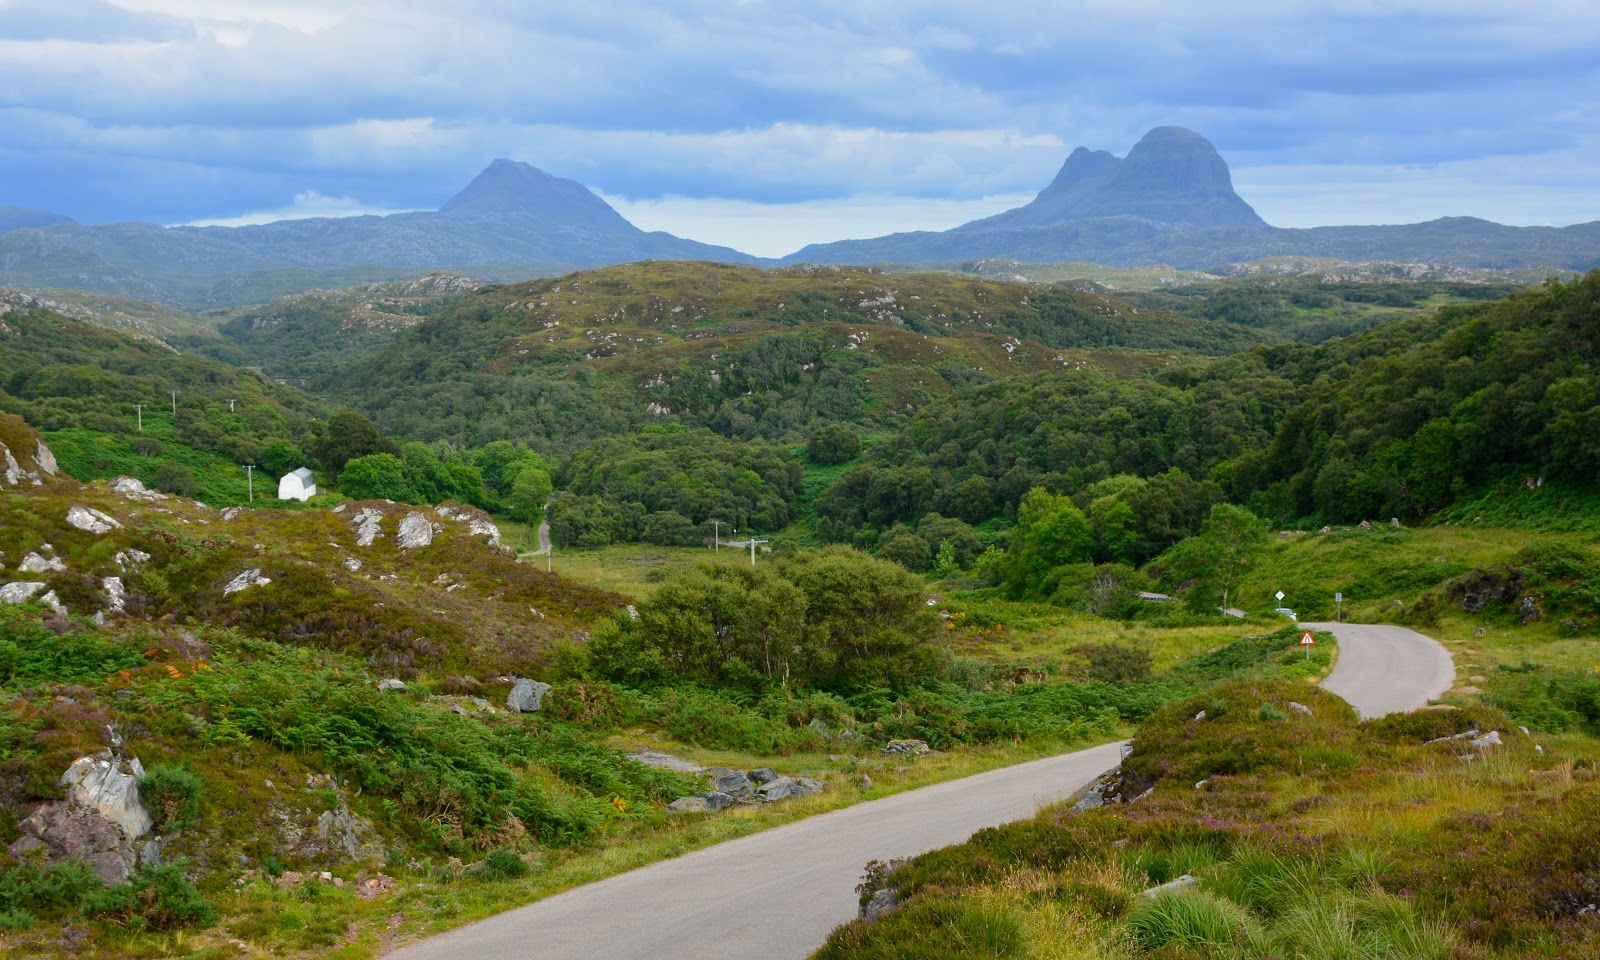 Assynt in northwestern Scotland